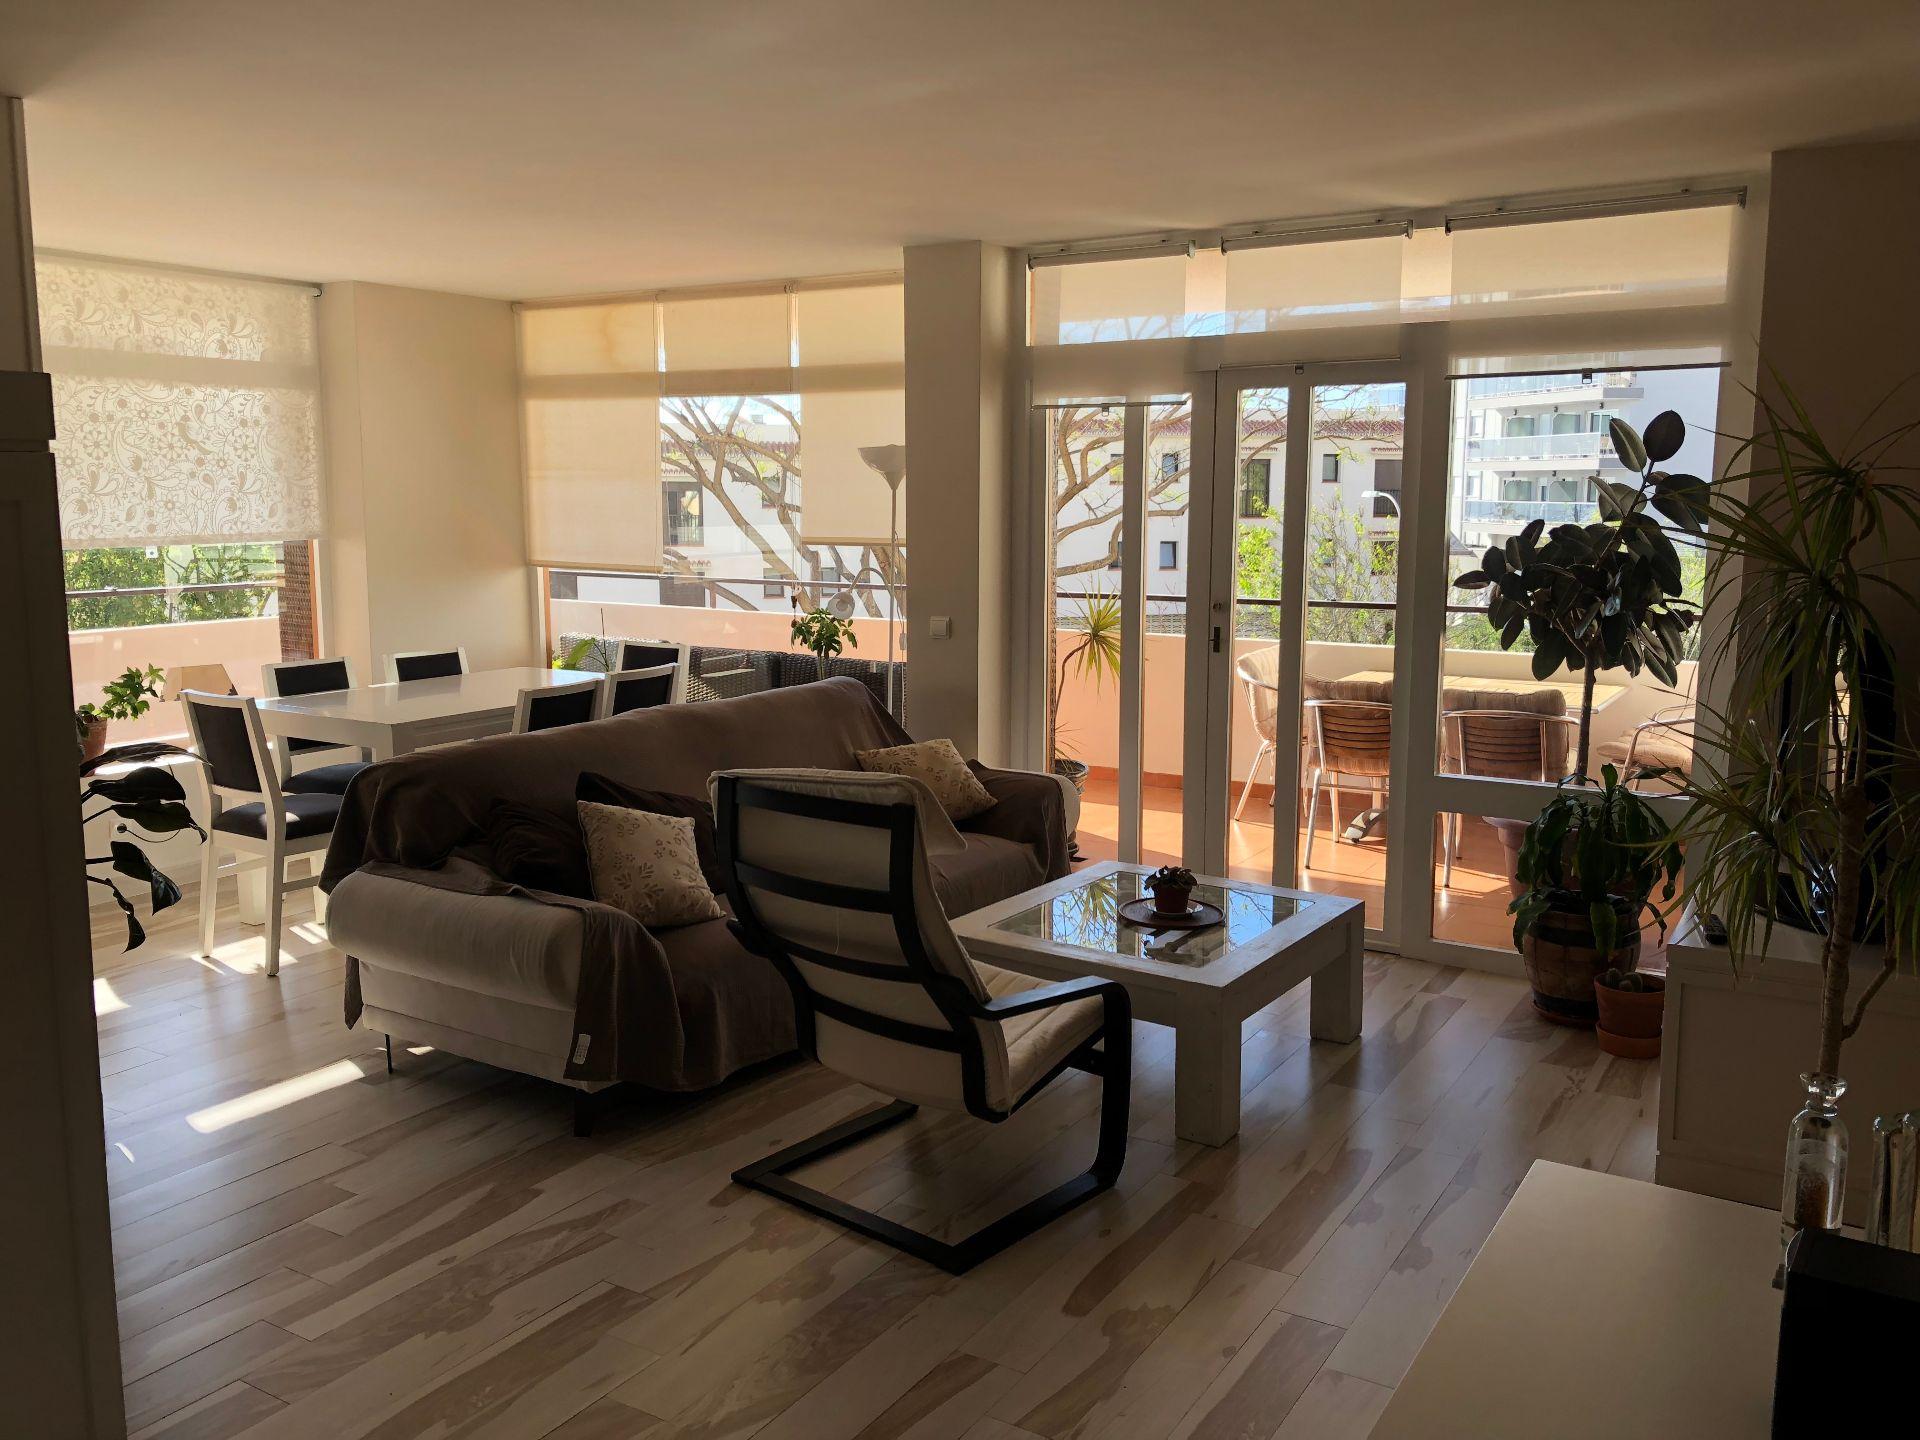 Apartment in Torremolinos, Playamar, verkauf